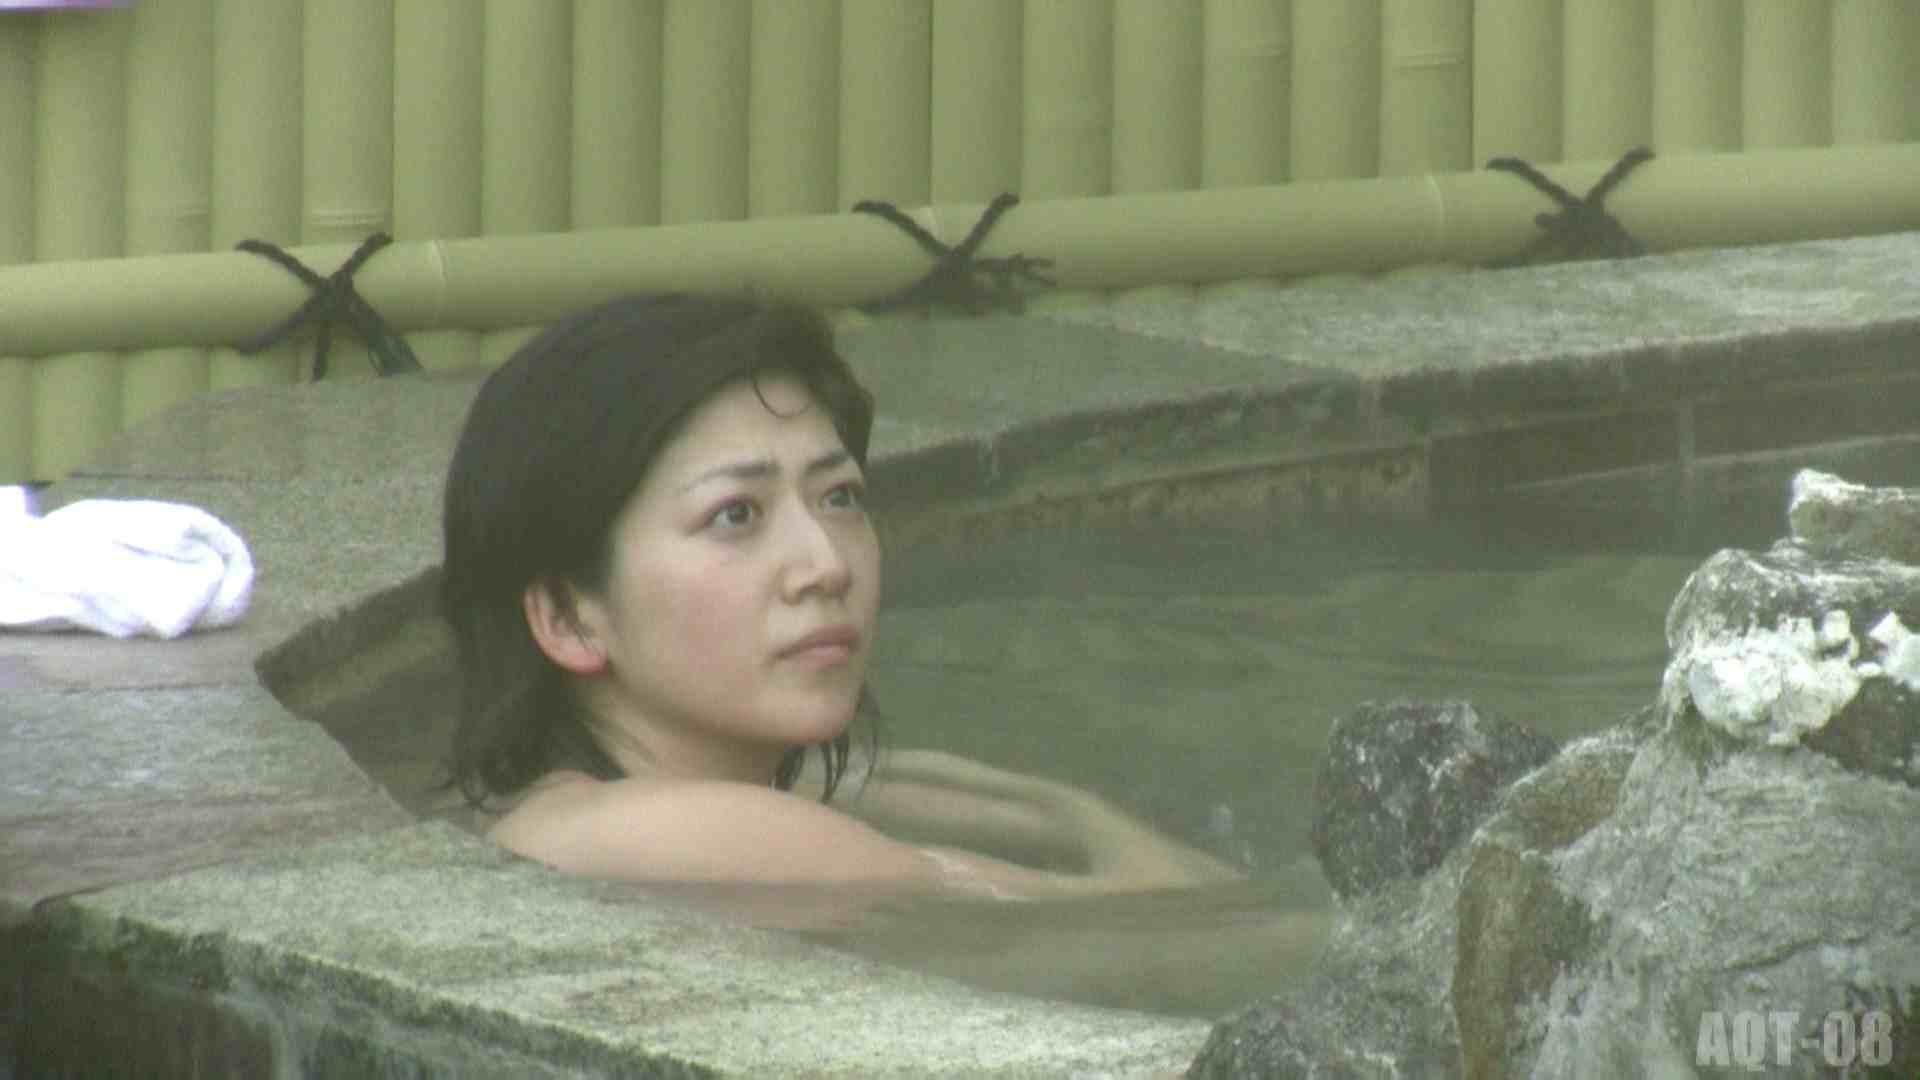 Aquaな露天風呂Vol.776 盗撮 | HなOL  60pic 46